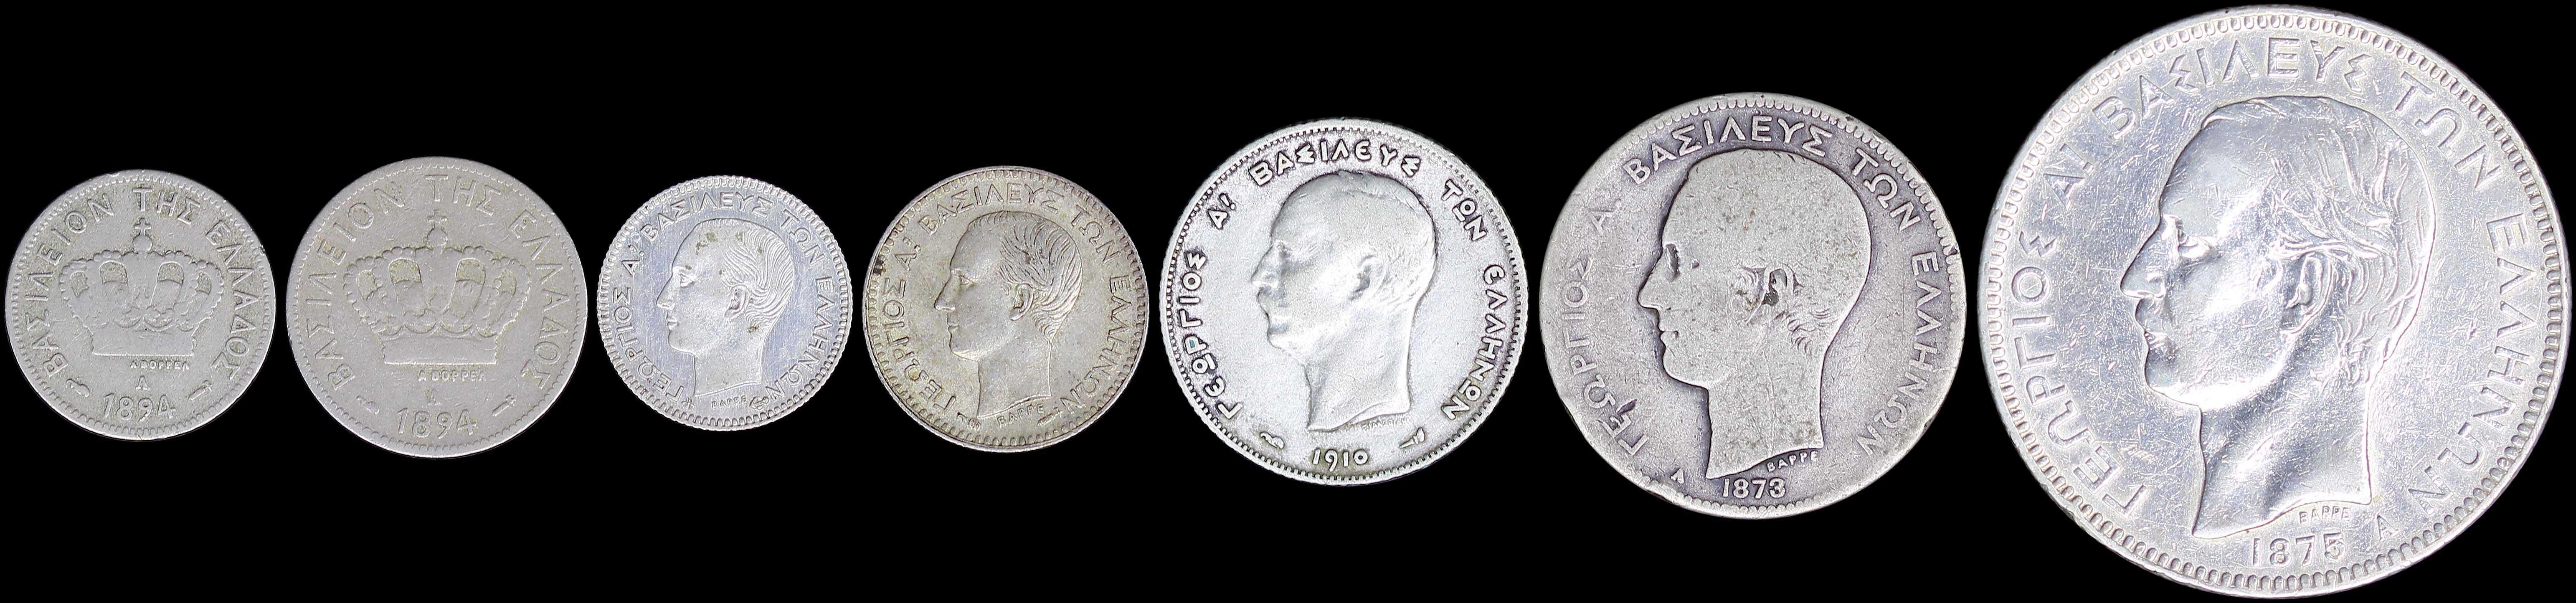 Lot 6104 - -  COINS & TOKENS king george i -  A. Karamitsos Postal & Live Internet Auction 984  (Part A)